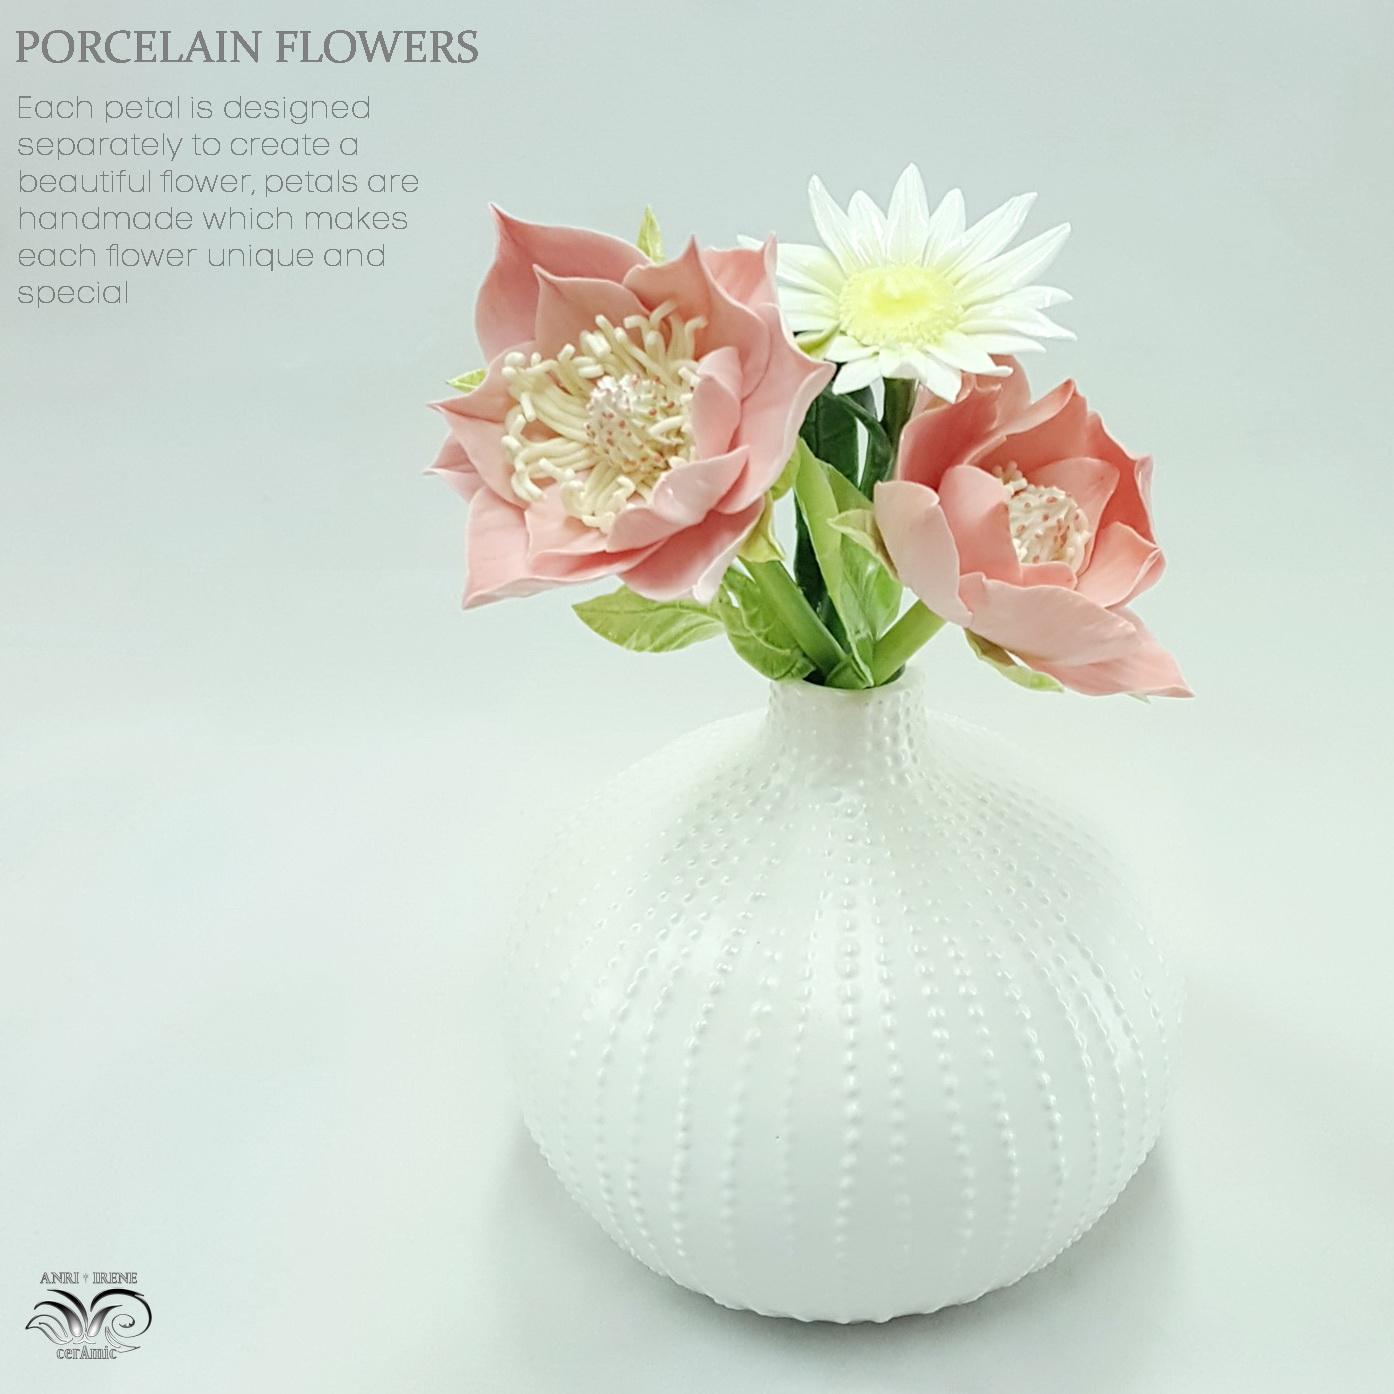 Ceramic porcelain flowers